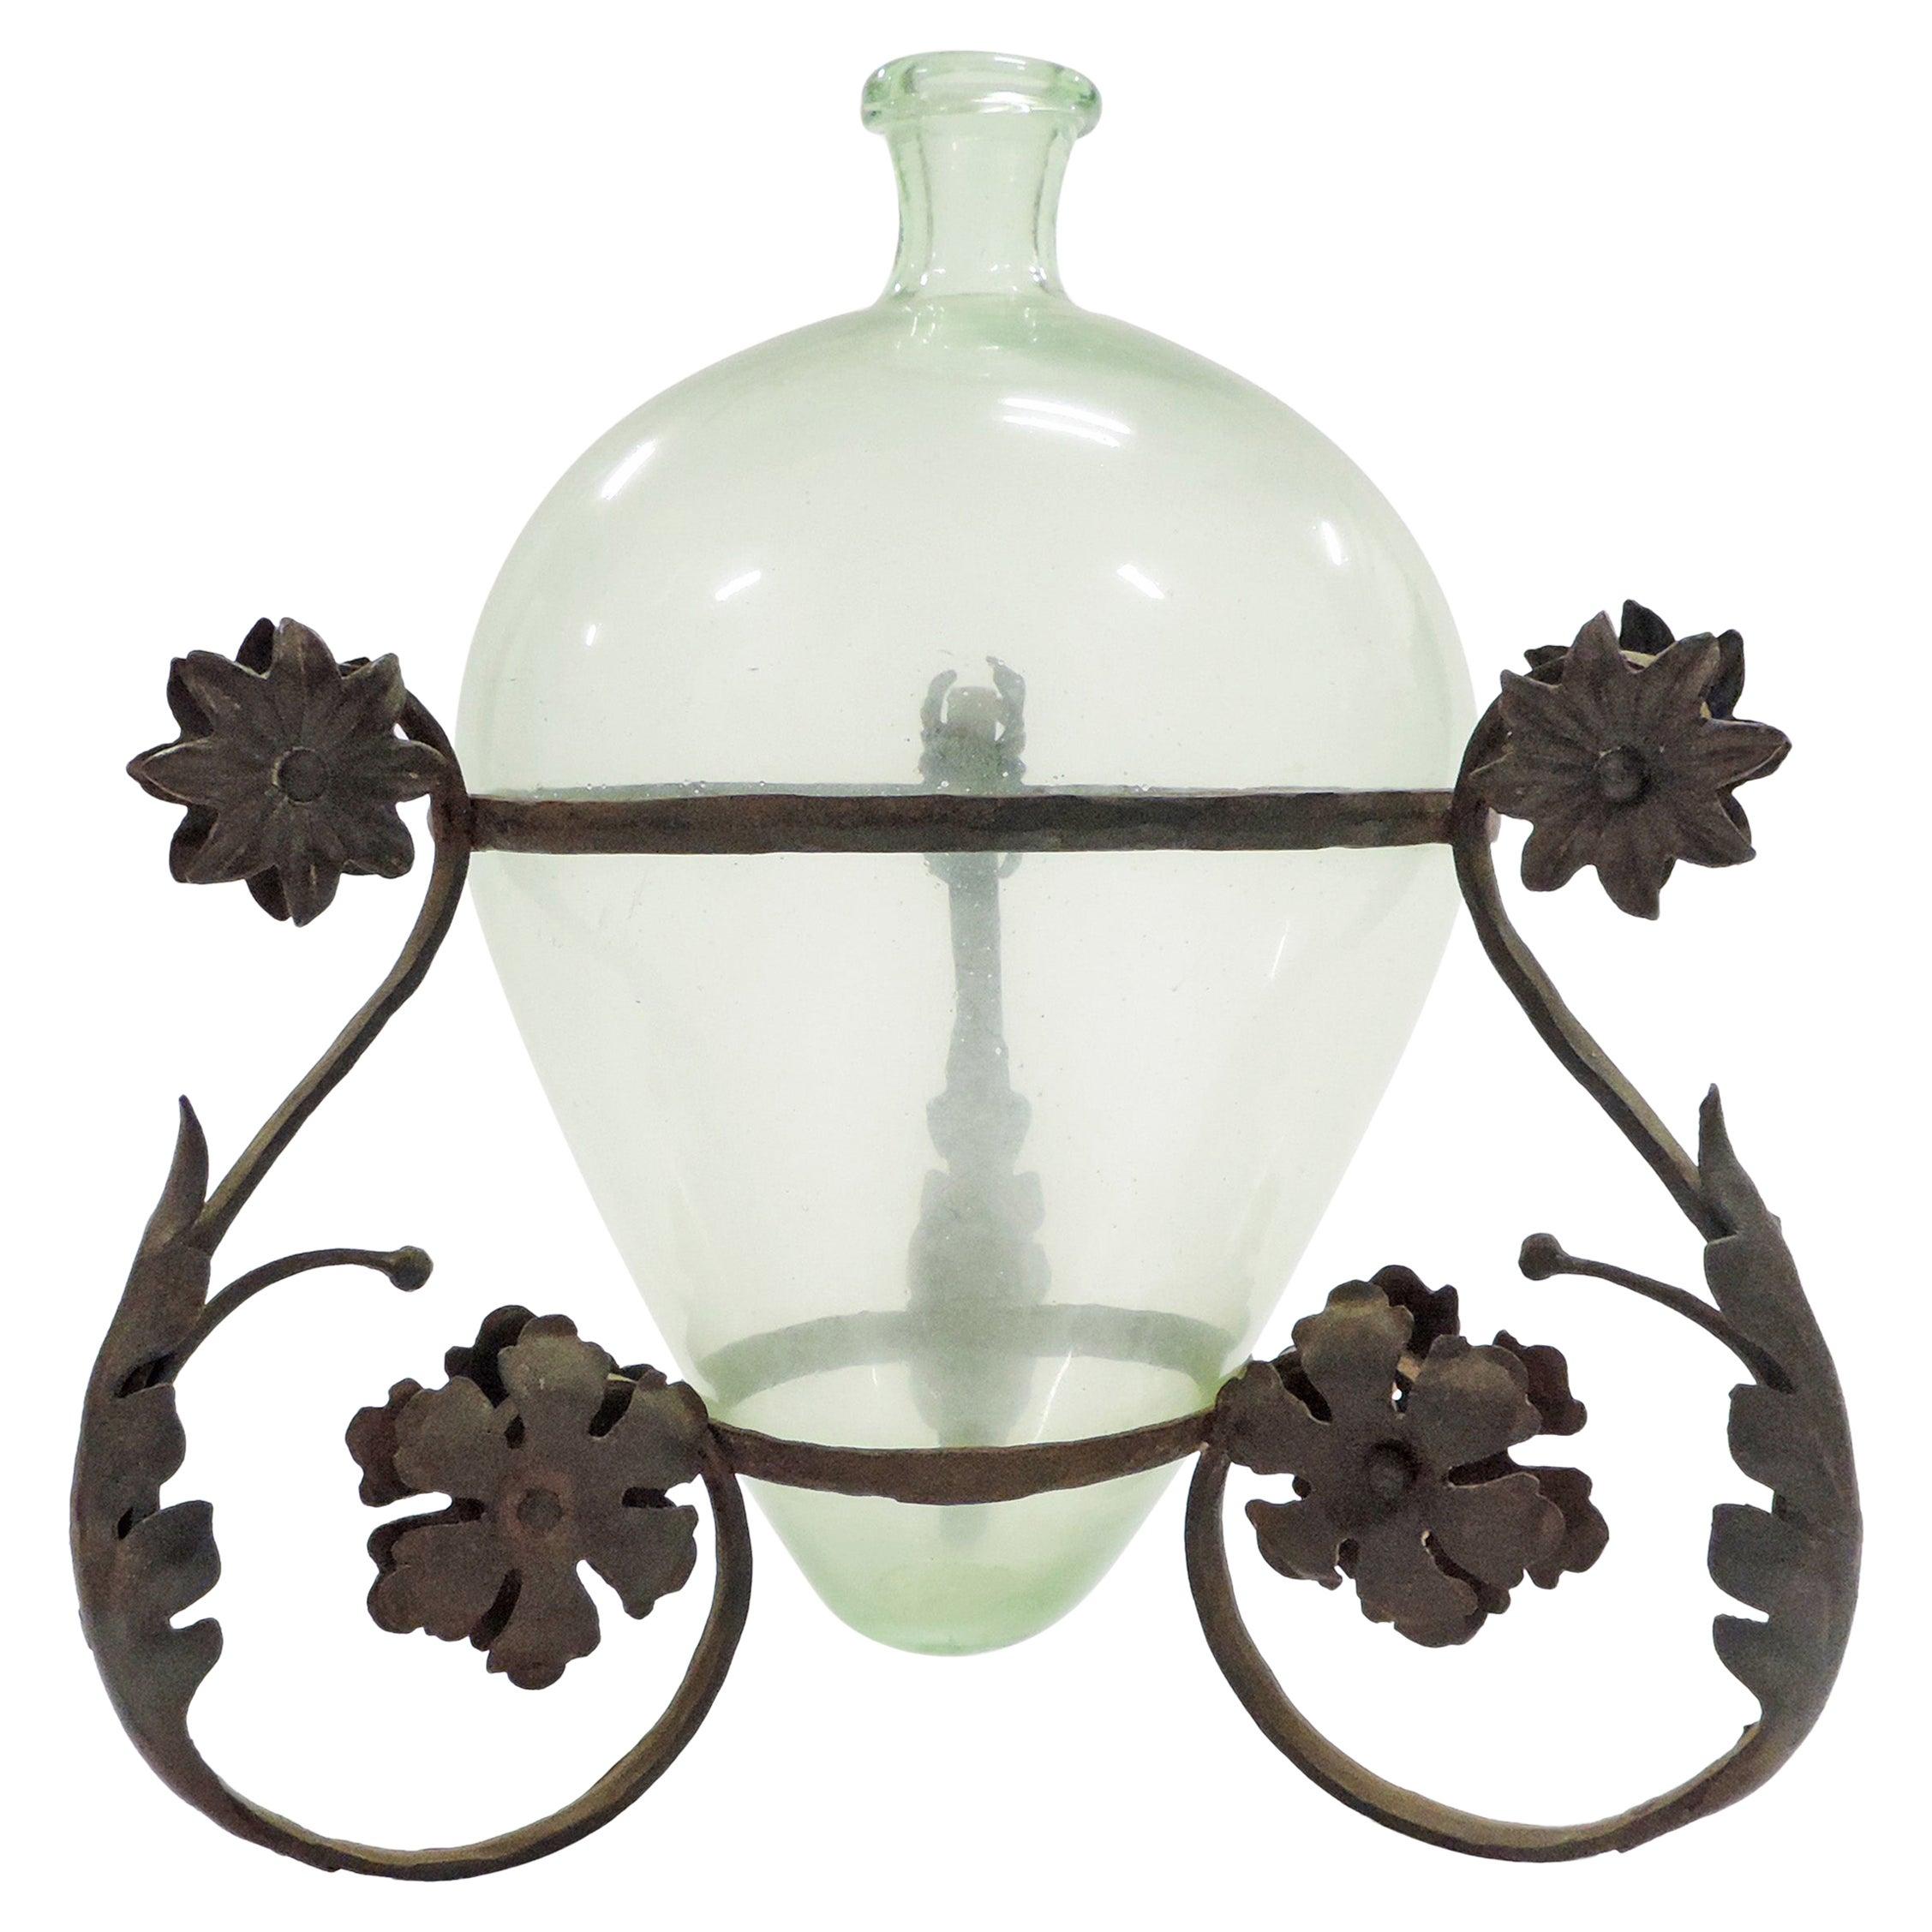 Carlo Rizzarda Wrought Iron and Blown Murano Glass Vase, Italy, 1920s